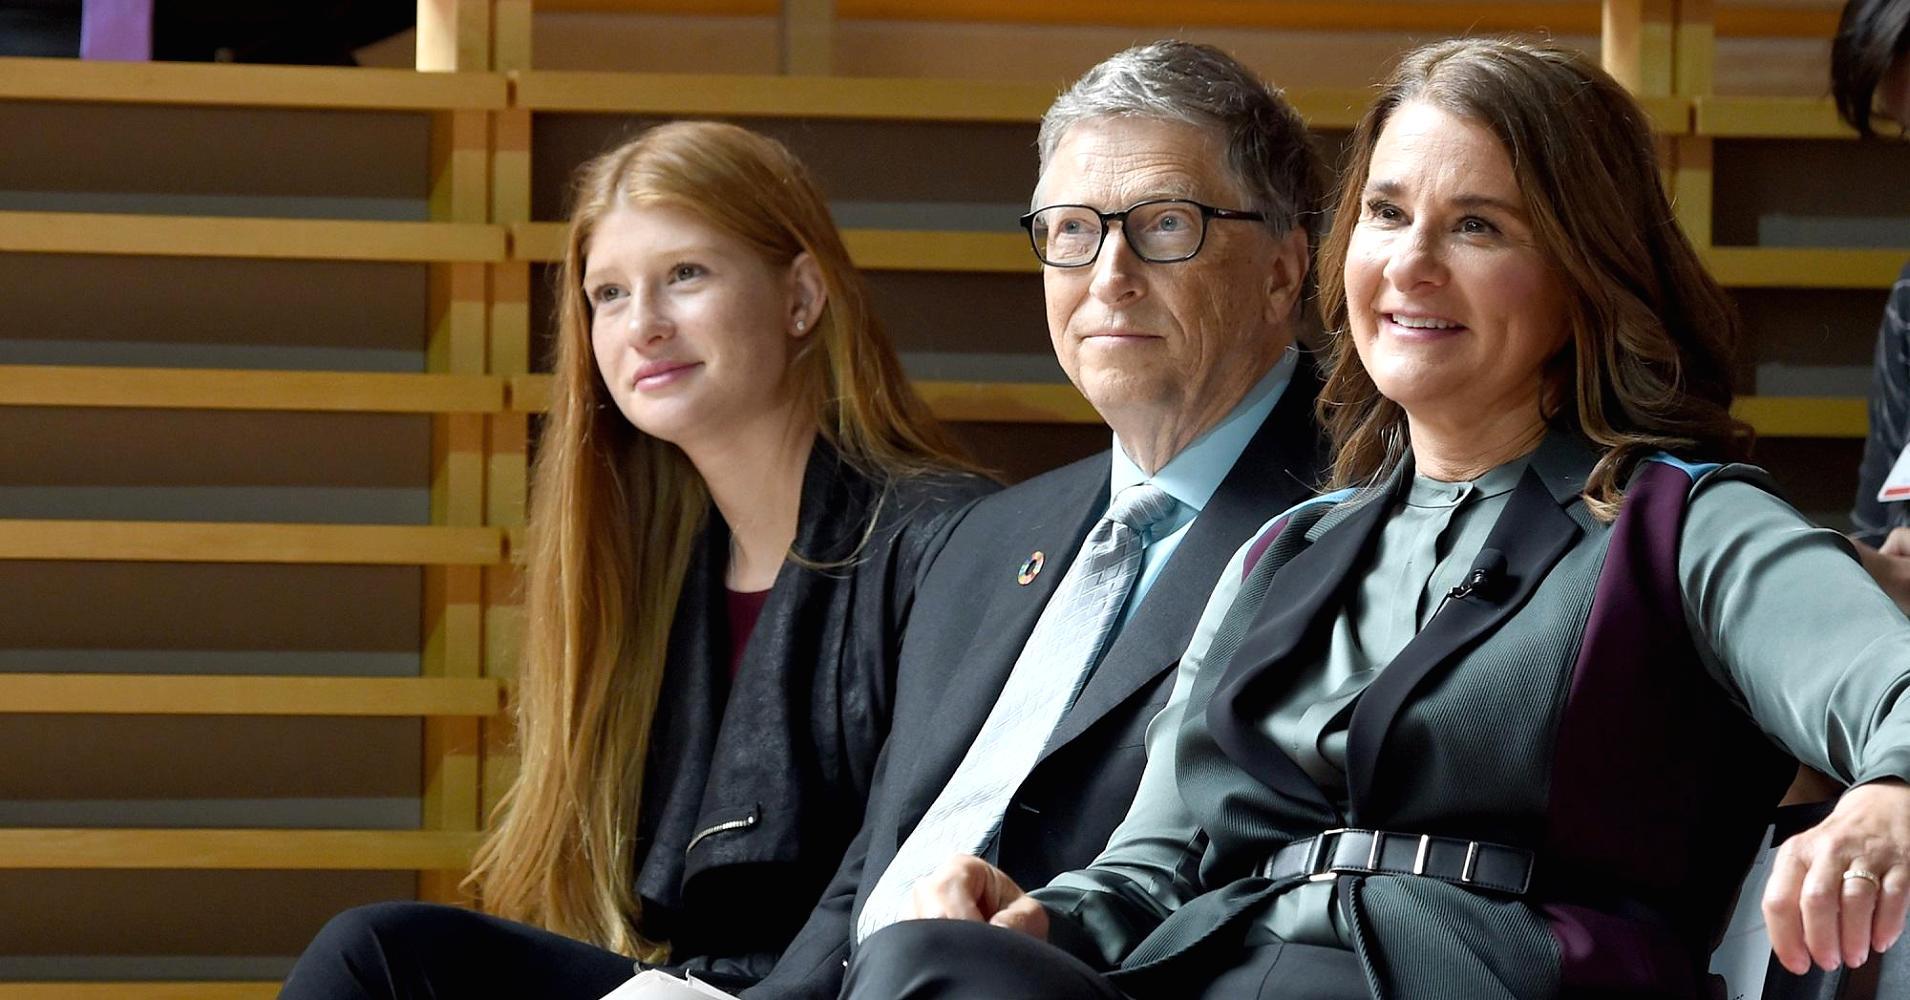 Phoebe Adele Gates, Bill Gates, and Melinda Gates attend the Goalkeepers 2017.